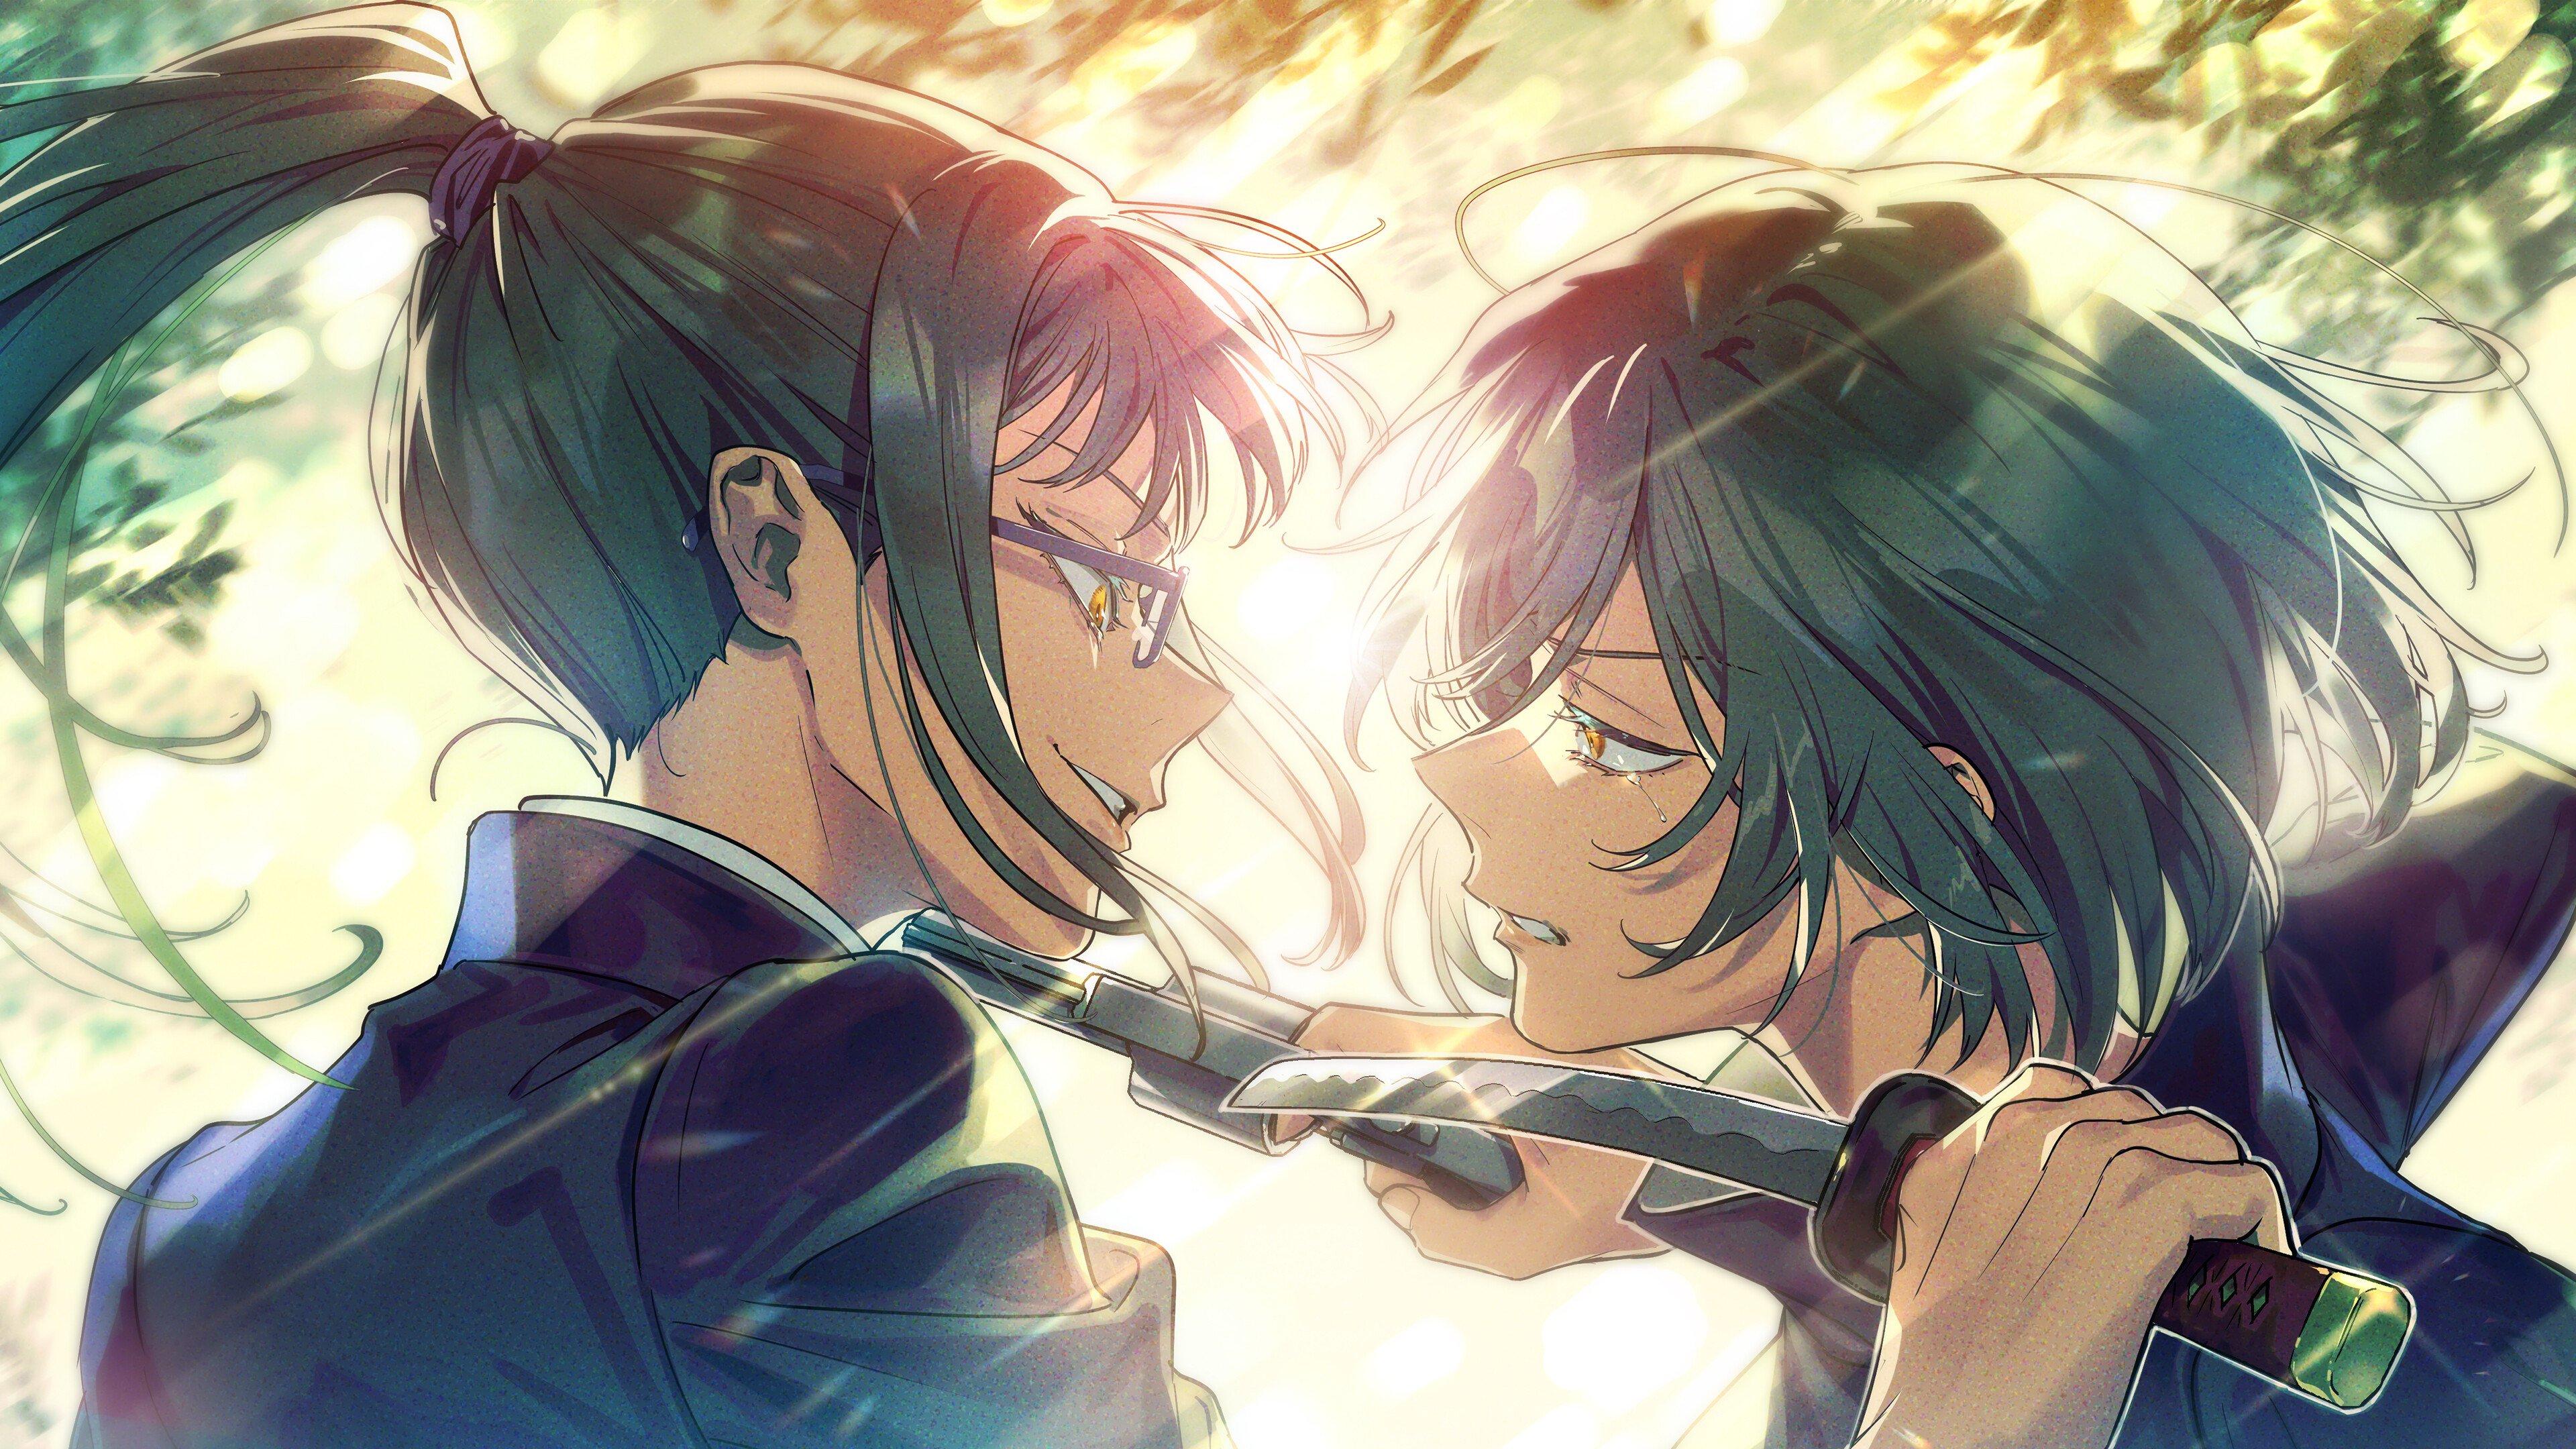 Fondos de pantalla Anime Maki Zenin vs Mai Zenin de Jujutsu Kaisen